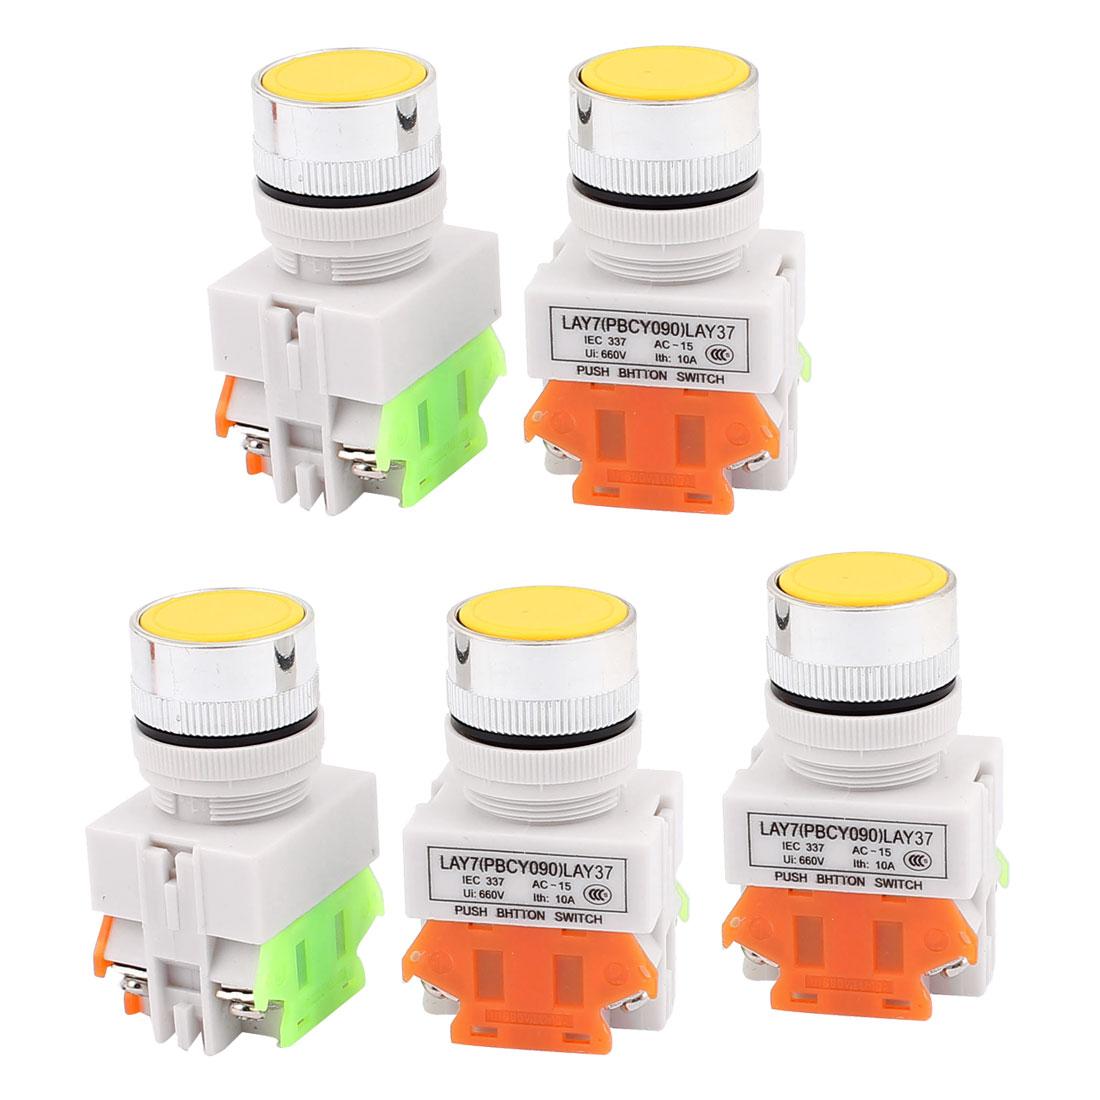 5PCS AC 660V 10A 1NO 1NC DPST 4-Pin Yellow Push Button Switch